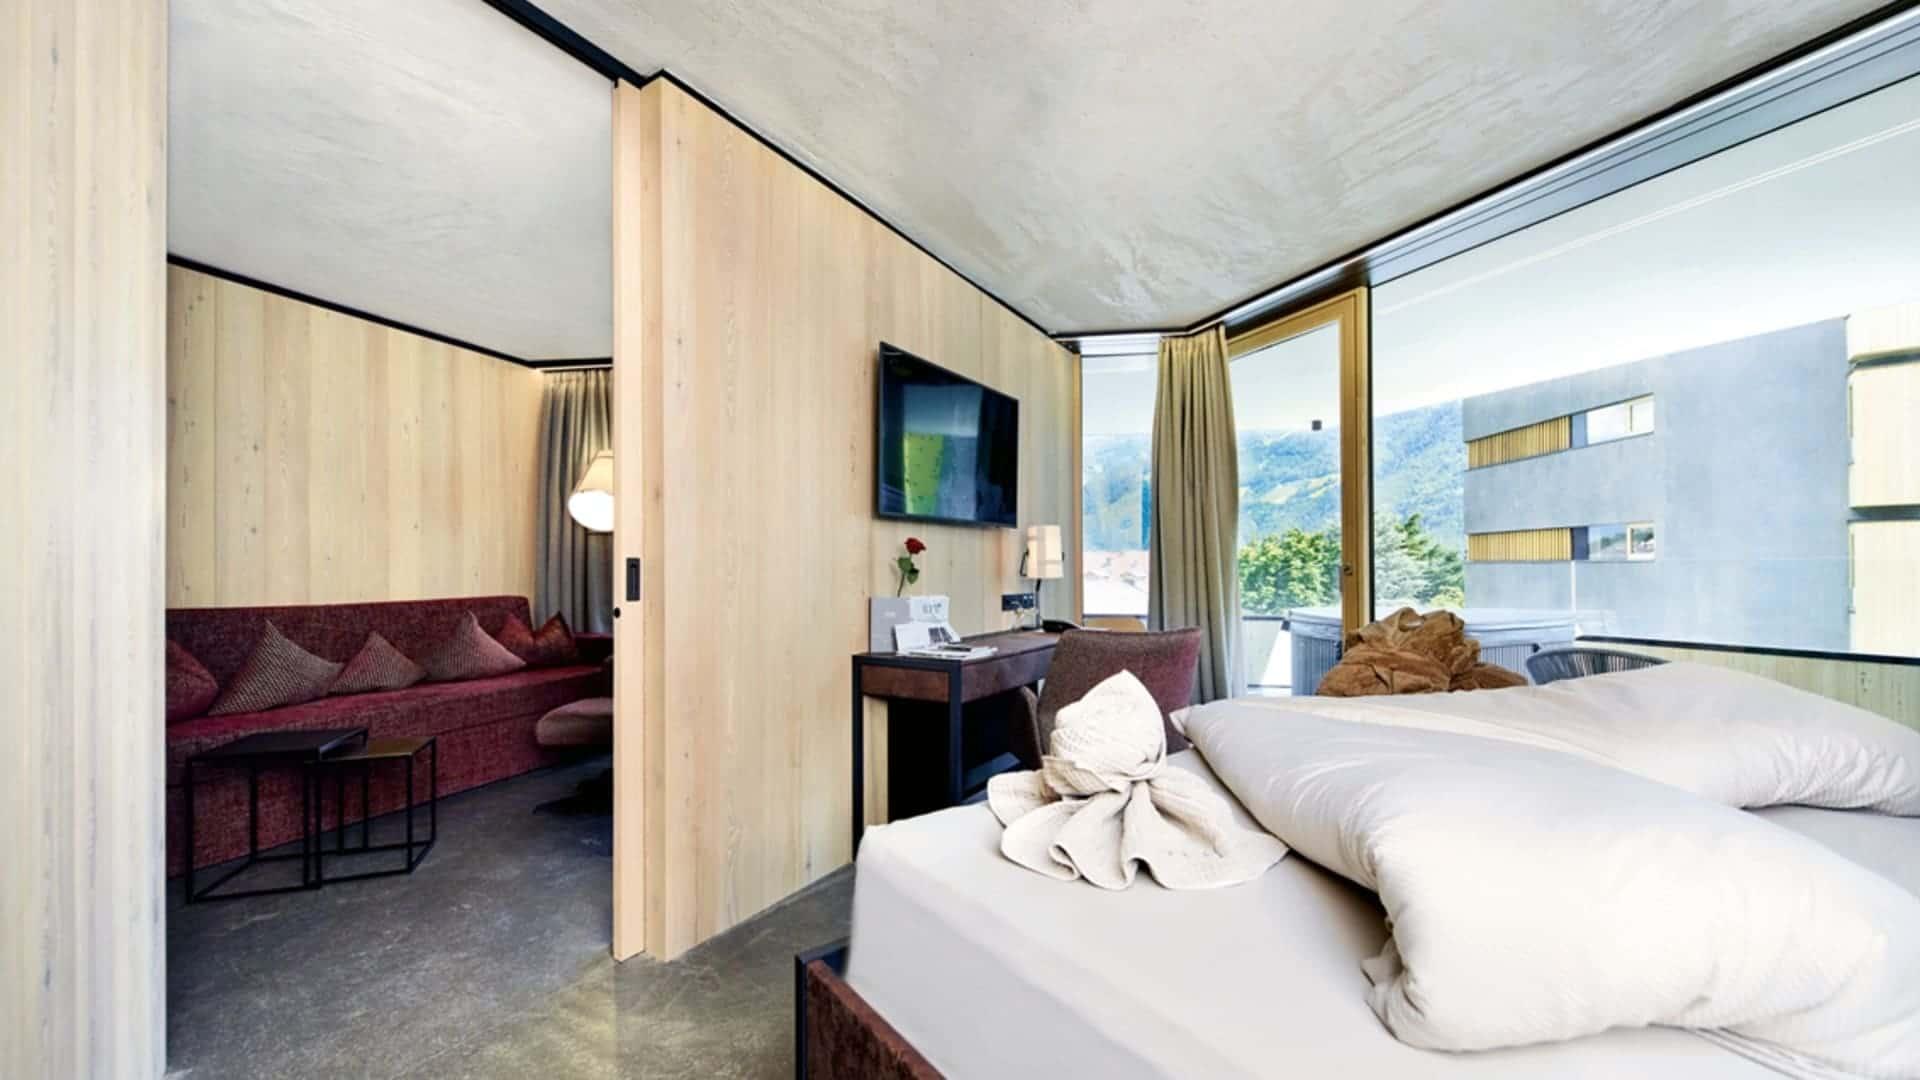 Suite Relax - Urlaubsgenuss voller Extras